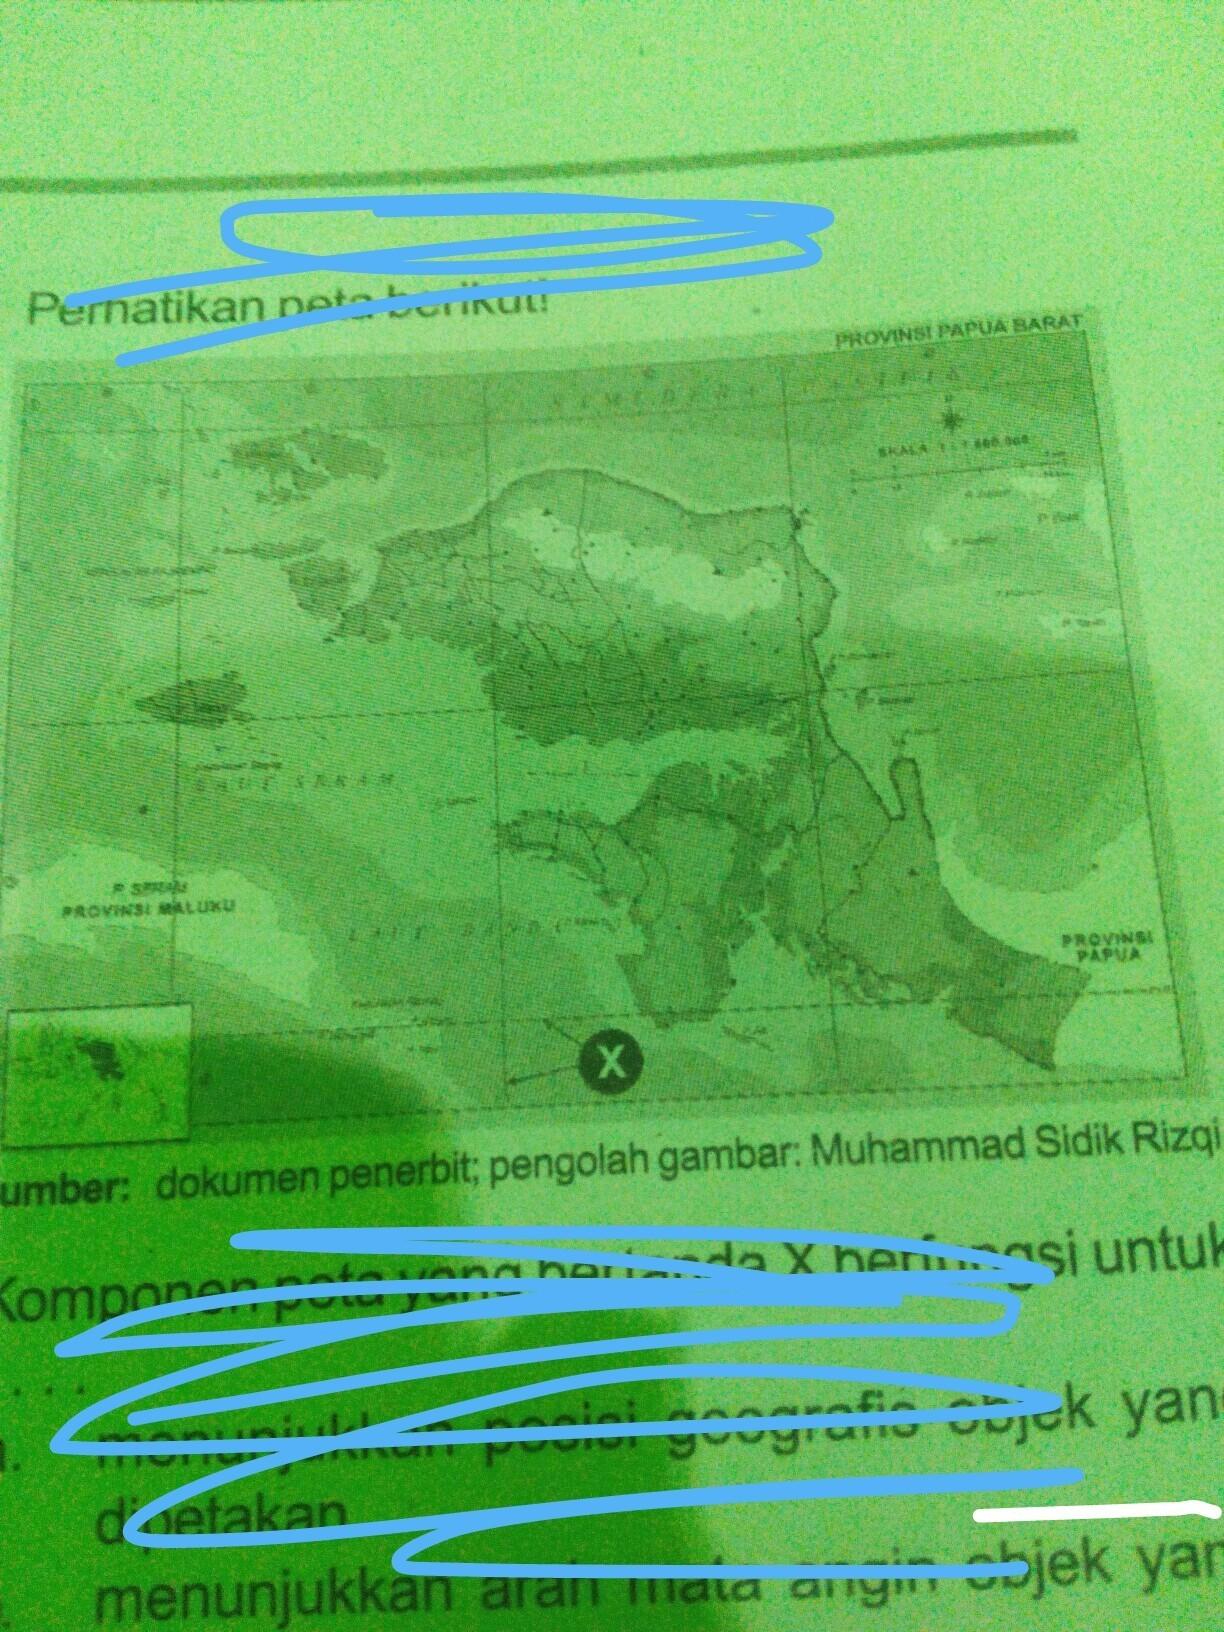 Setiap peta harus memiliki judul atau identitas peta itu sendiri yang mencerminkan isi peta itu sendiri pula. Perhatikan Gambar Peta Berikut Komponen Peta Yang Bertanda X Brrfungsi Untuka Menunjukan Posisi Brainly Co Id